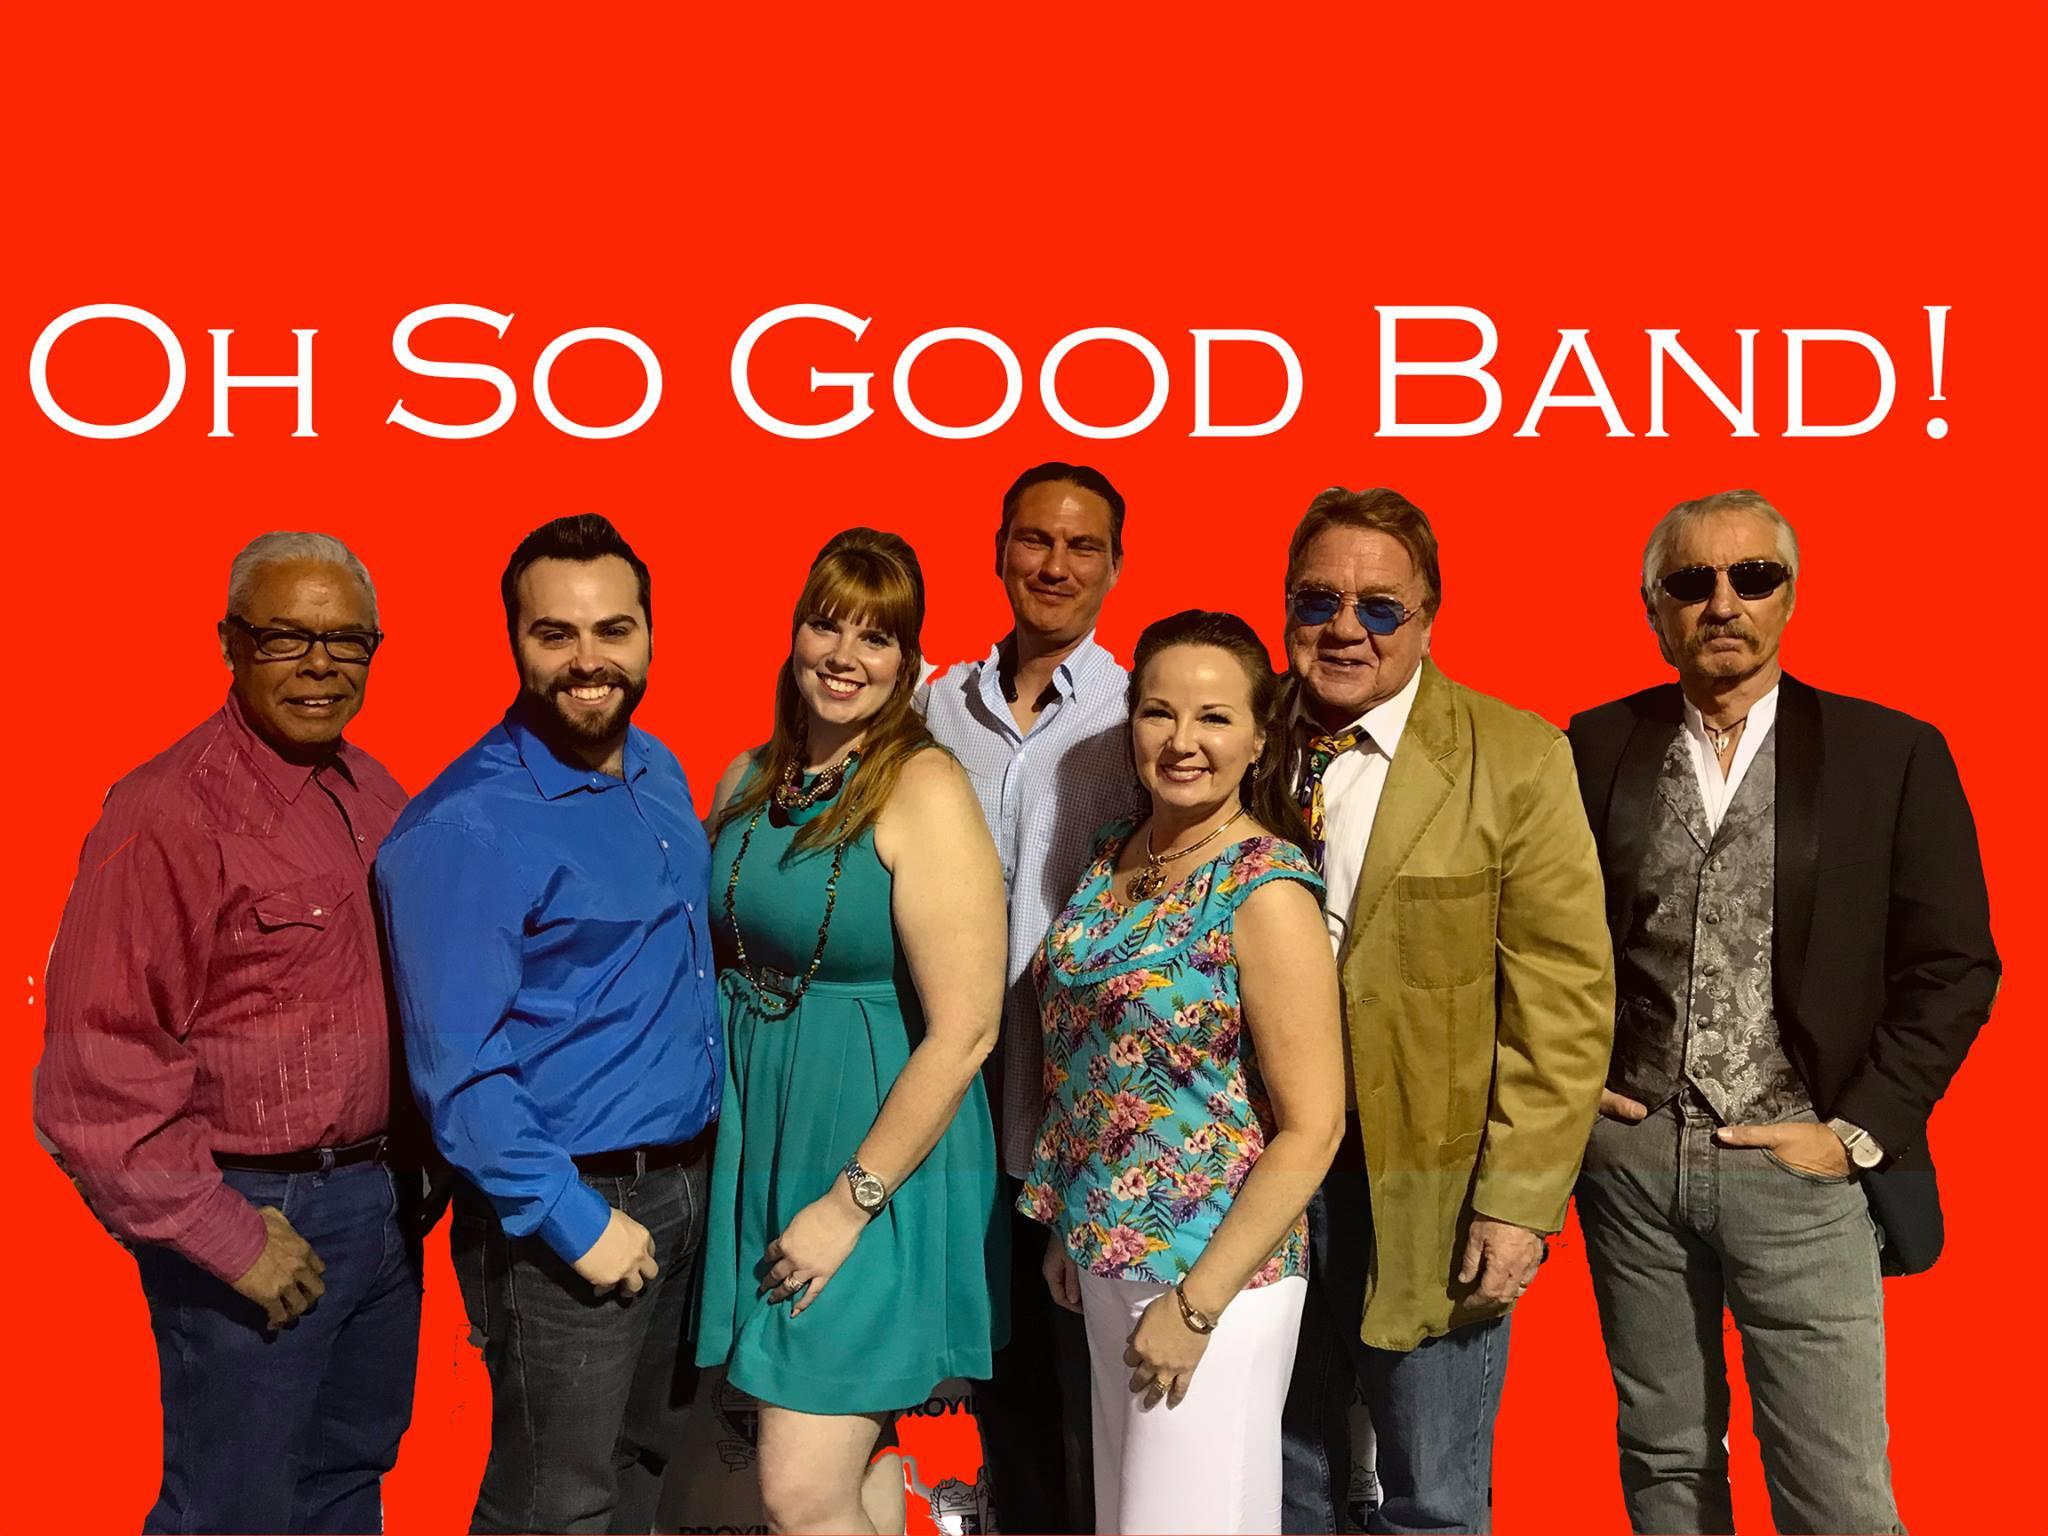 Oh So Good Band! Photo